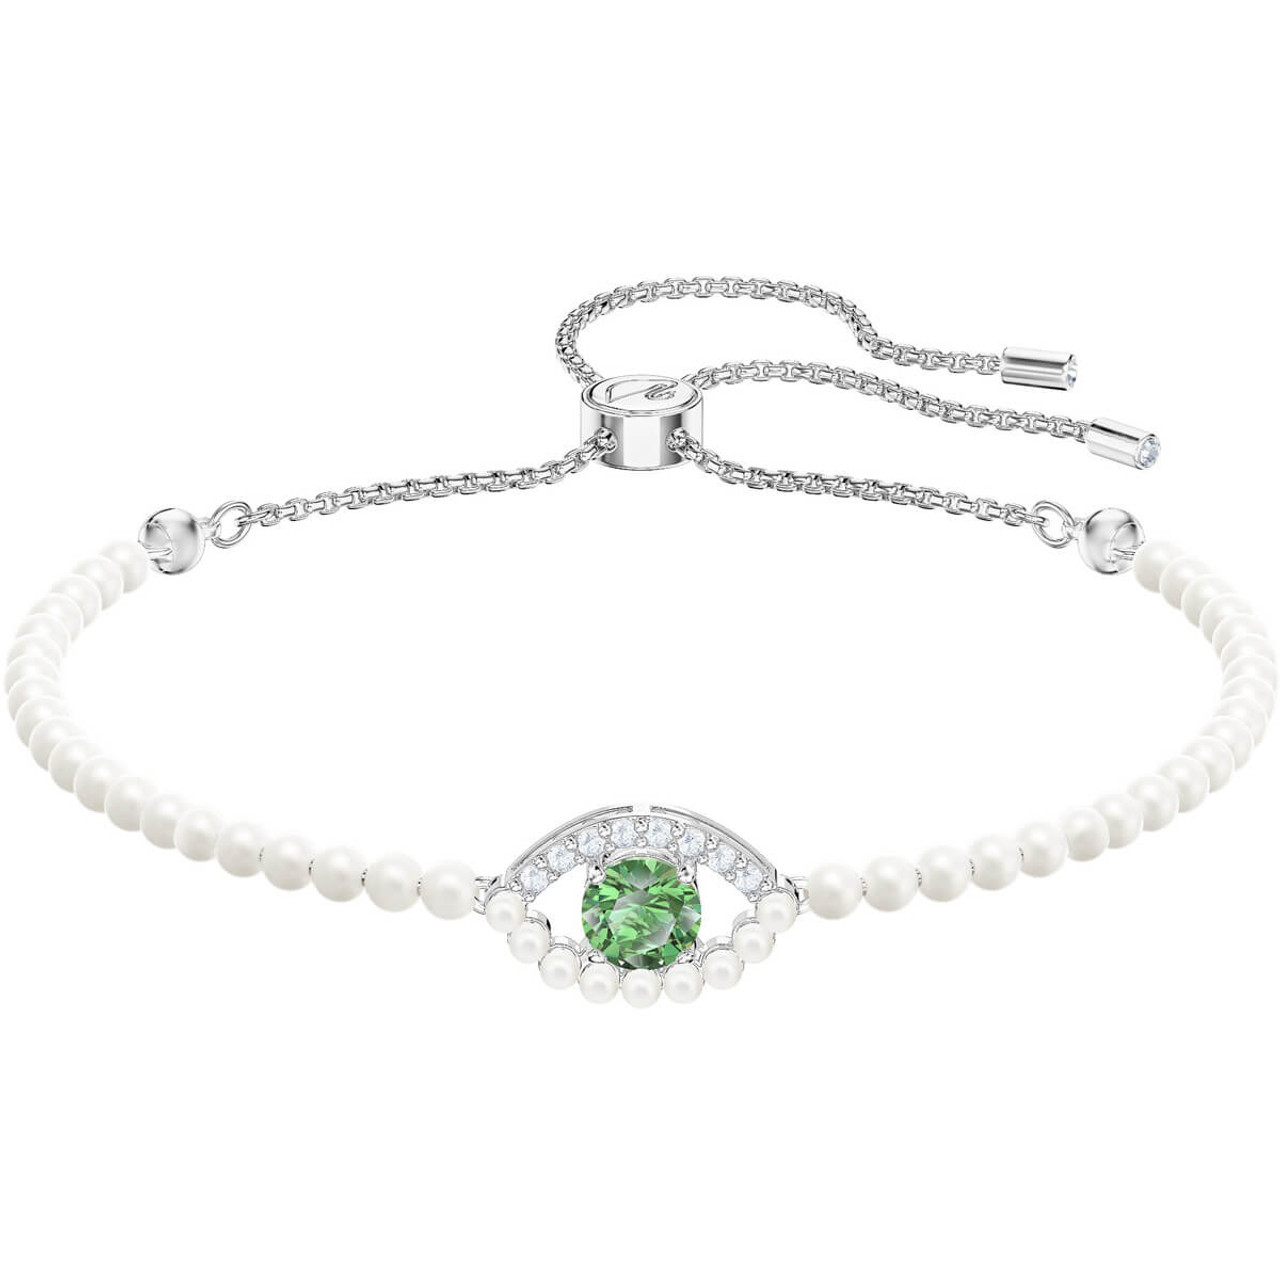 Swarovski Luckily Green Evil Eye Subtle Bracelet with Baby Pearls